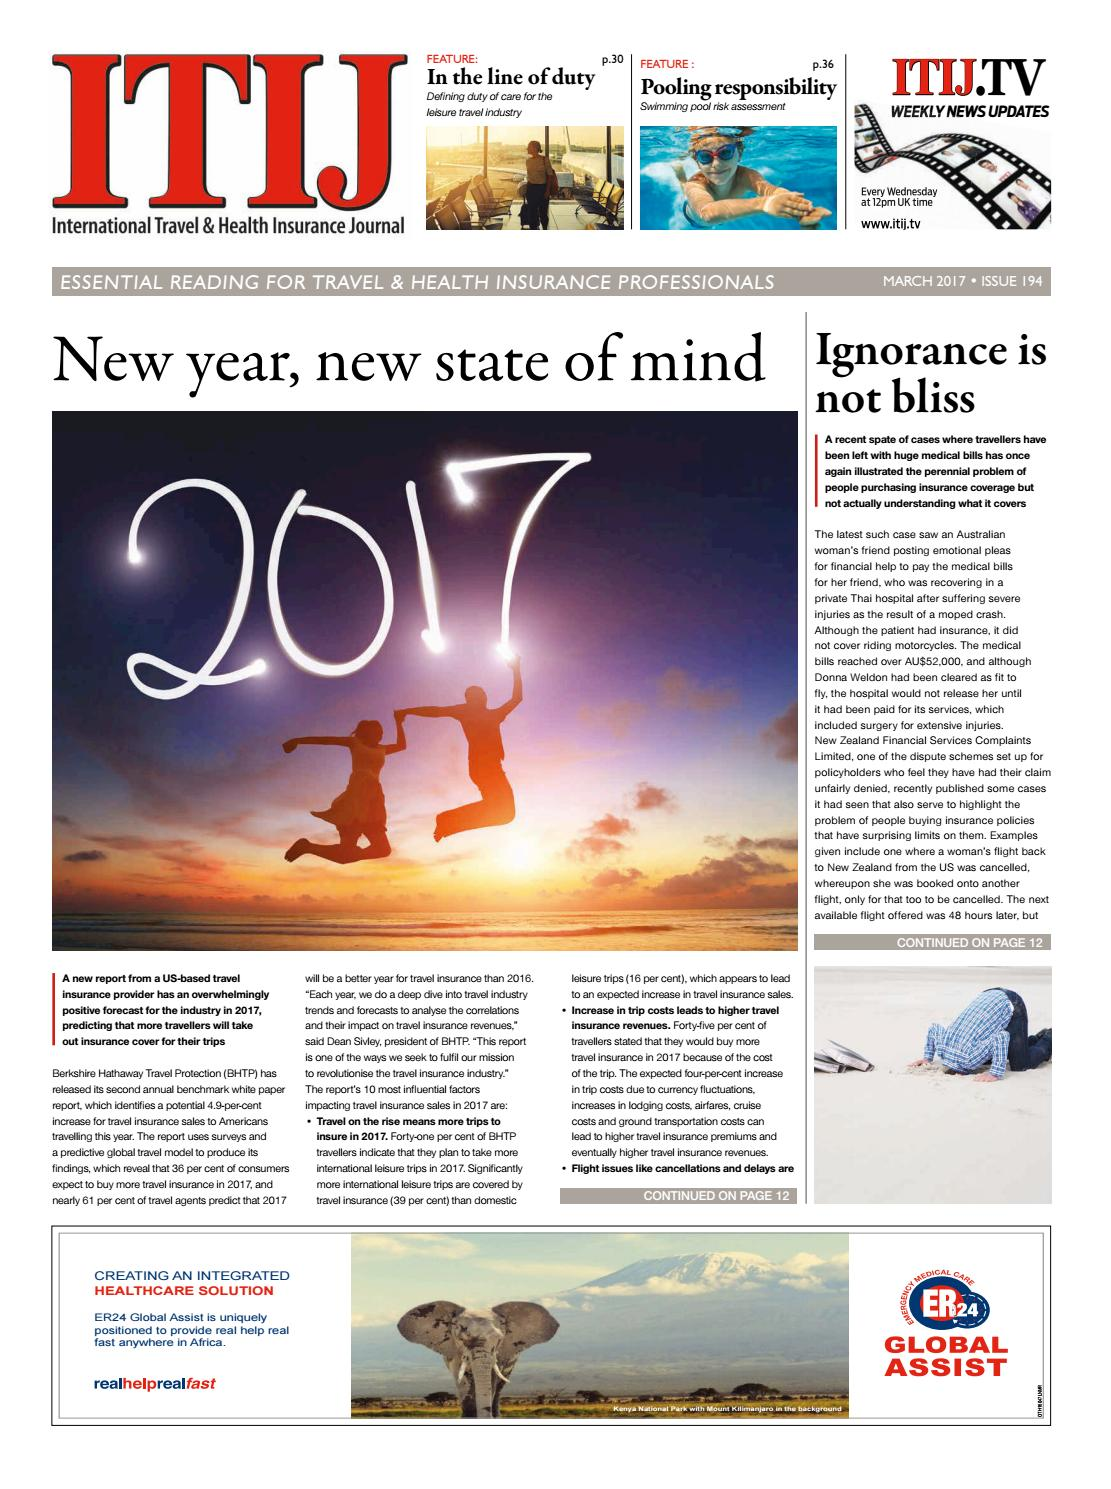 9891e49fa025a ITIJ 194 Mar 2017 by ITIJ: International travel & health insurance journal  - issuu